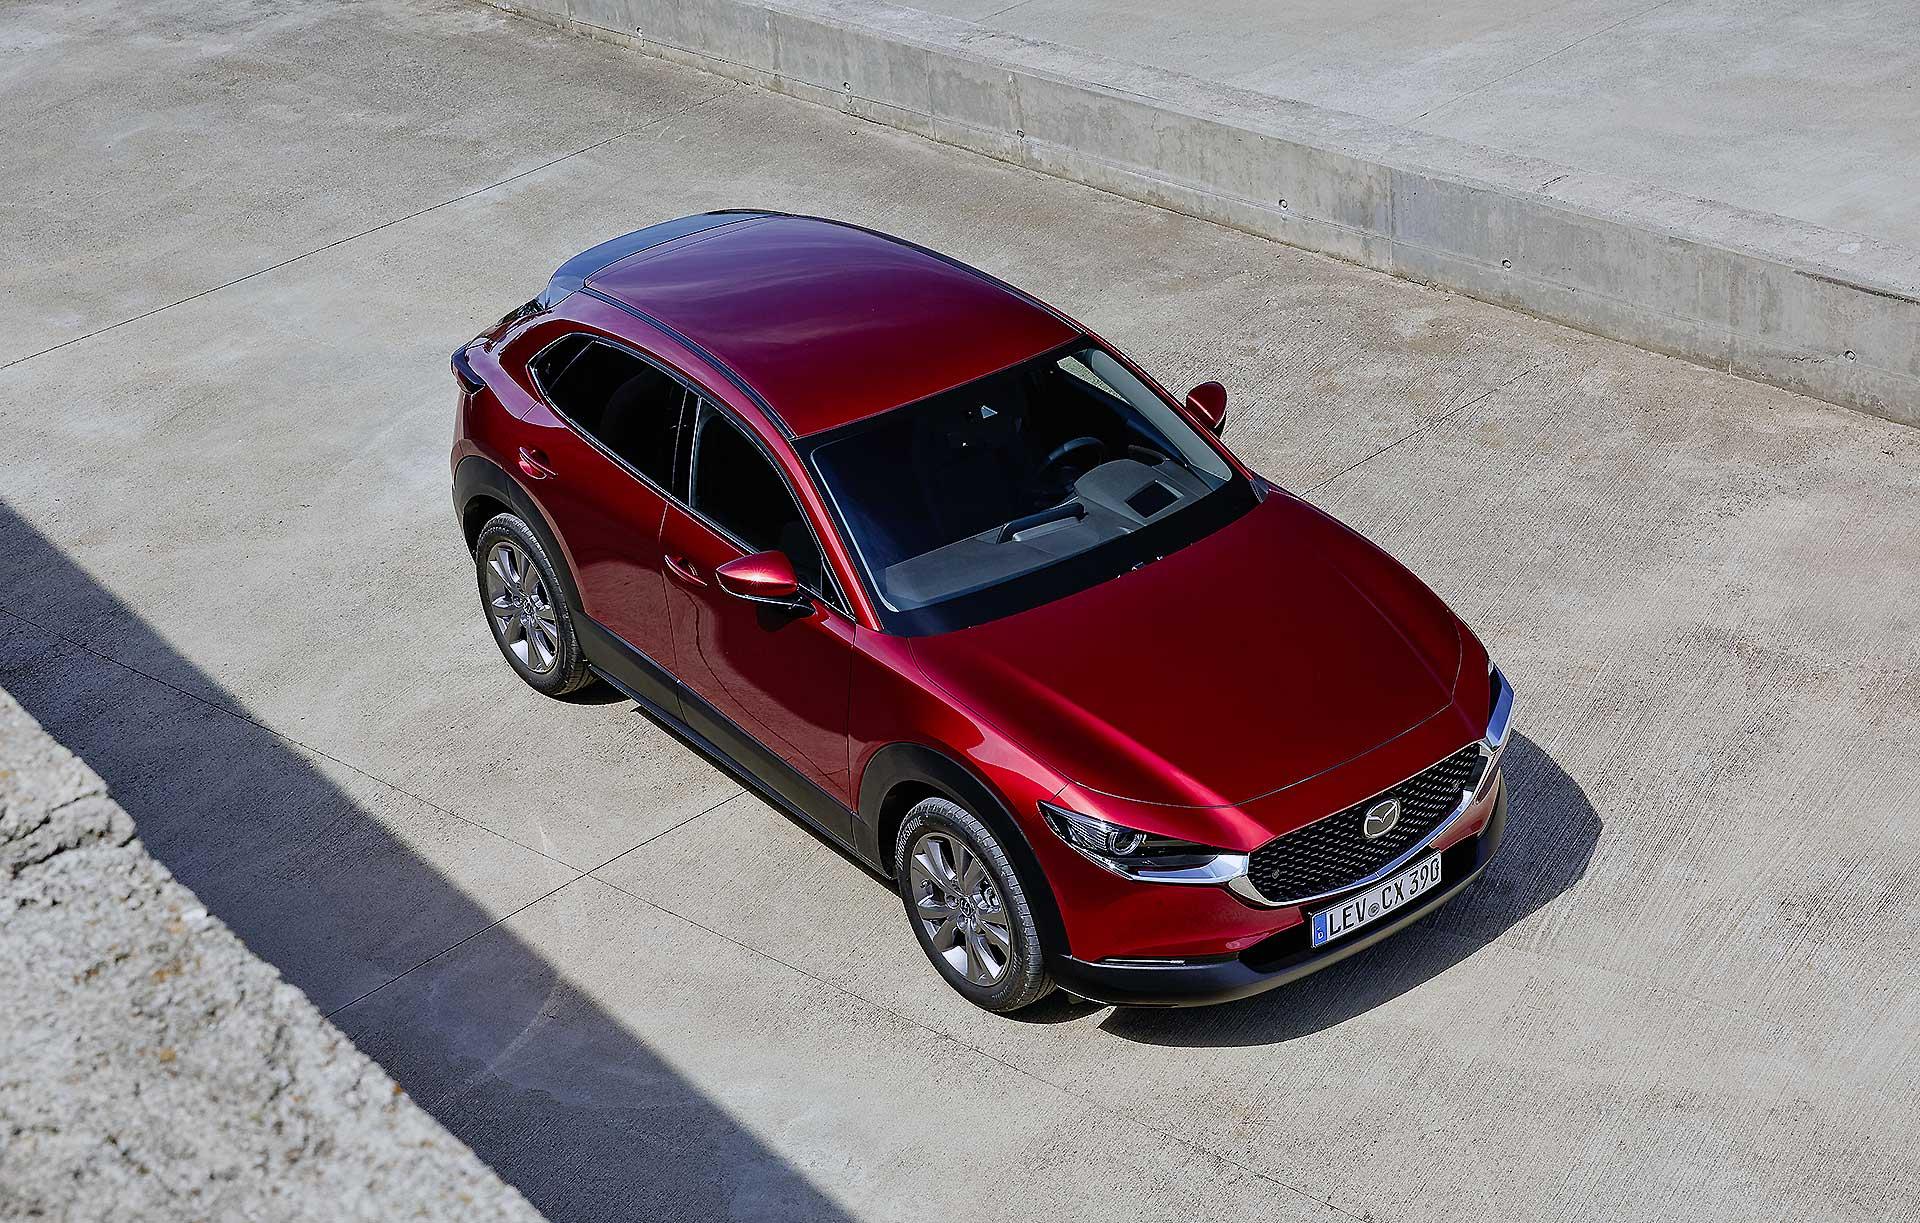 Mazda CX-30 Skyactiv-X vs diesel: quale scegliere? | Video ...